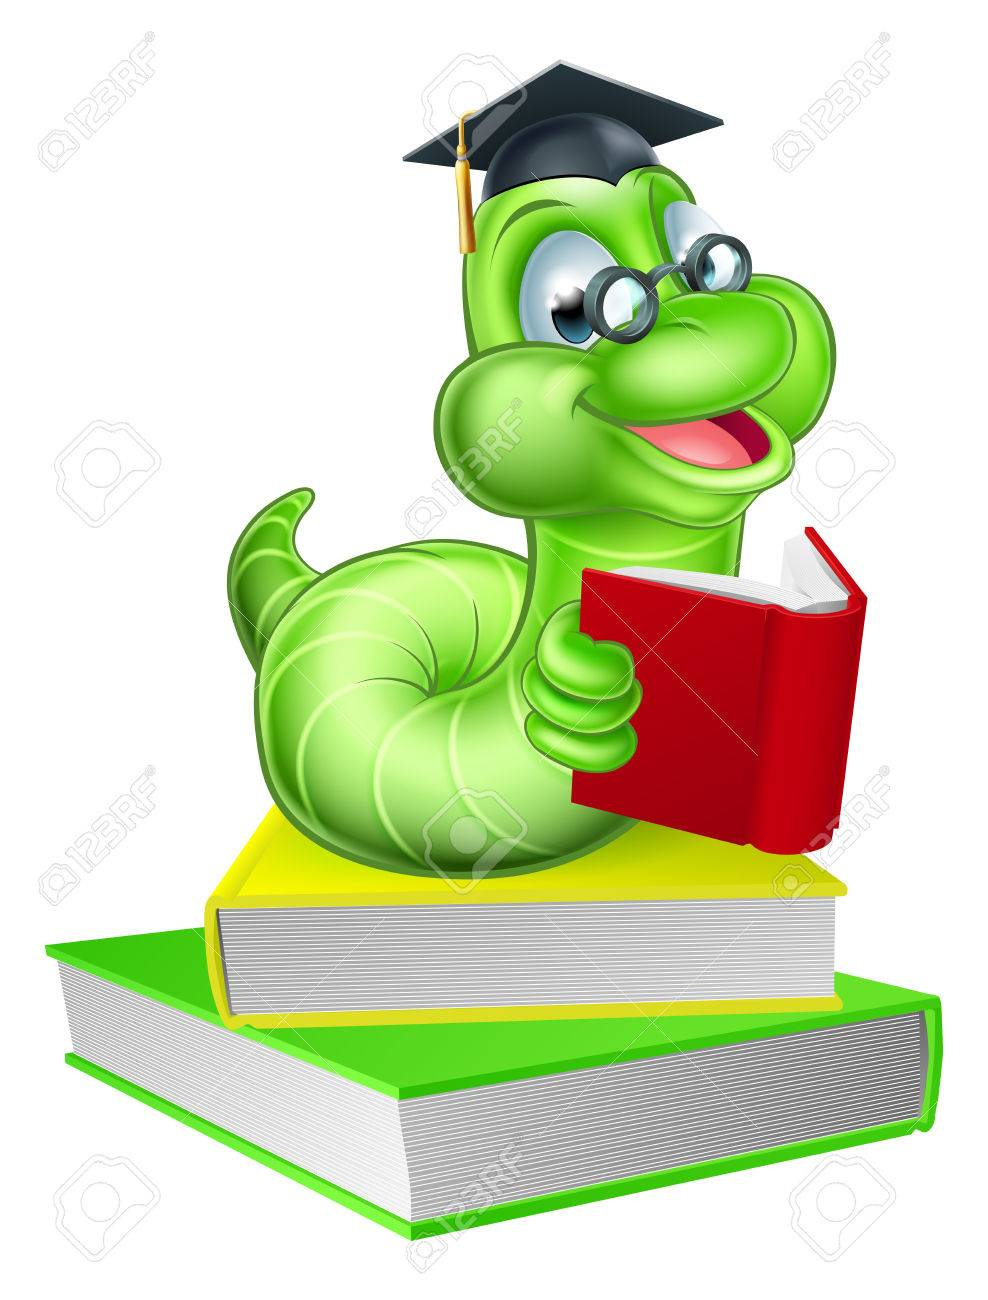 Cute smiling green cartoon caterpillar worm bookworm mascot wearing...